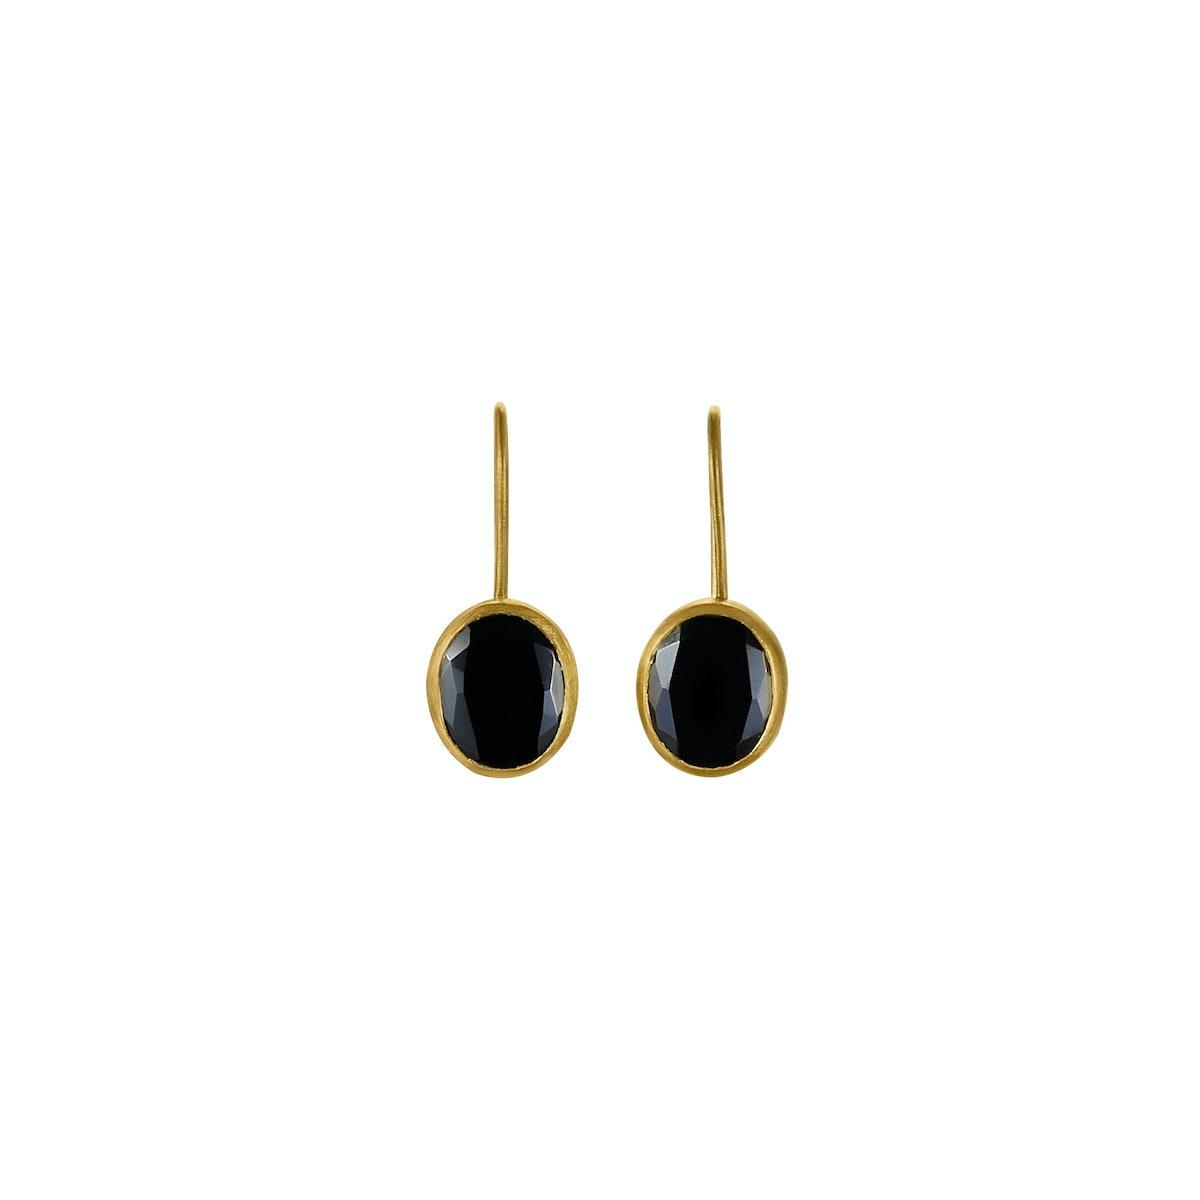 __For the classic girl:__ Eli Halili 24k gold and onyx earrings, $950, [elihalili.com](http://www.el...